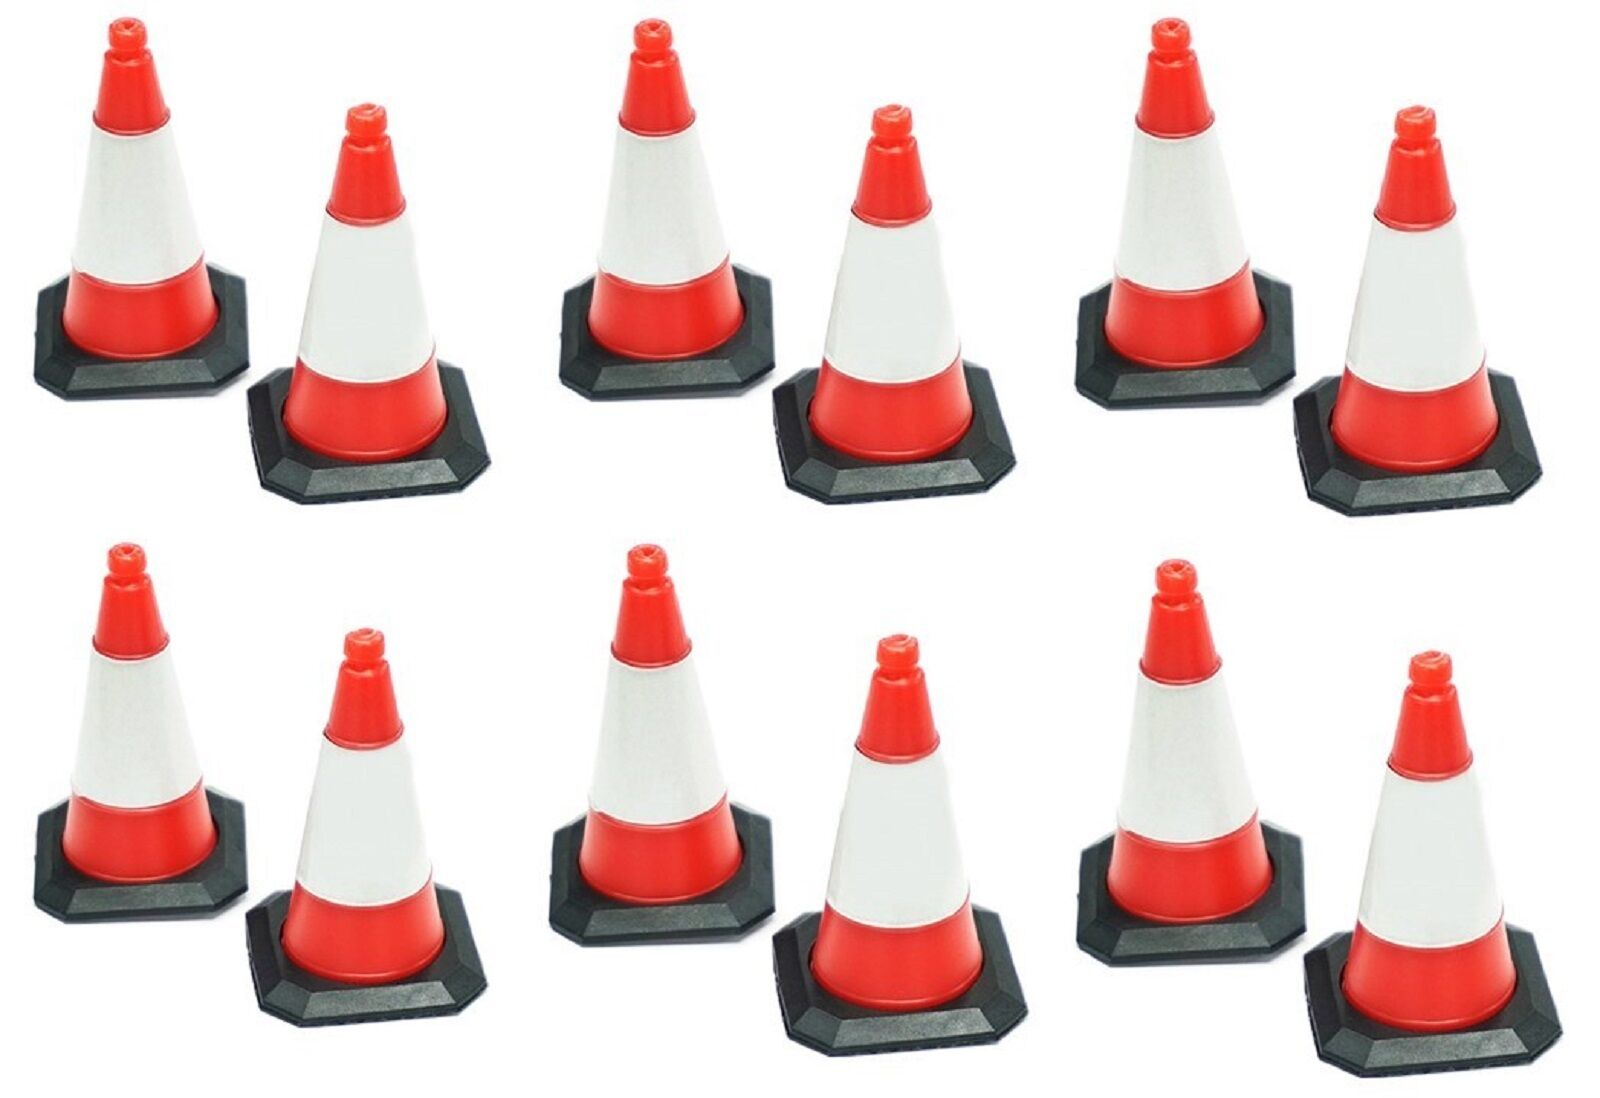 1 10 th scale traffic cones cones cones as an RC accessory- 12 pieces suit Axial D90 garage 39efd5